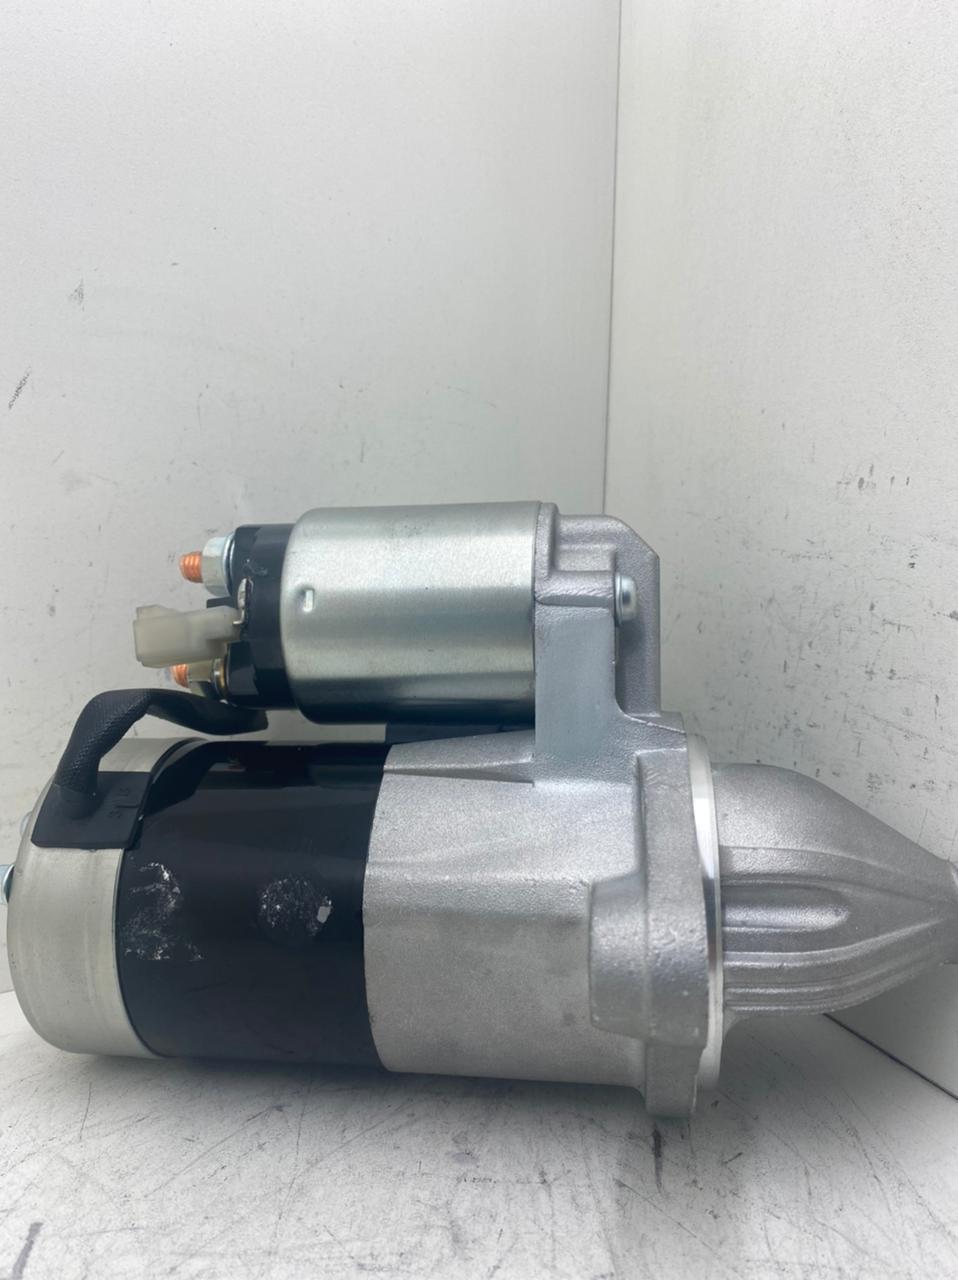 Motor de arranque KIA TOPIC JINBEI Empilhadeira Hangcha WANGFENG 12V 9 DENTES LE13050116 LE90479 WF491GP QDY1253A AEC14009